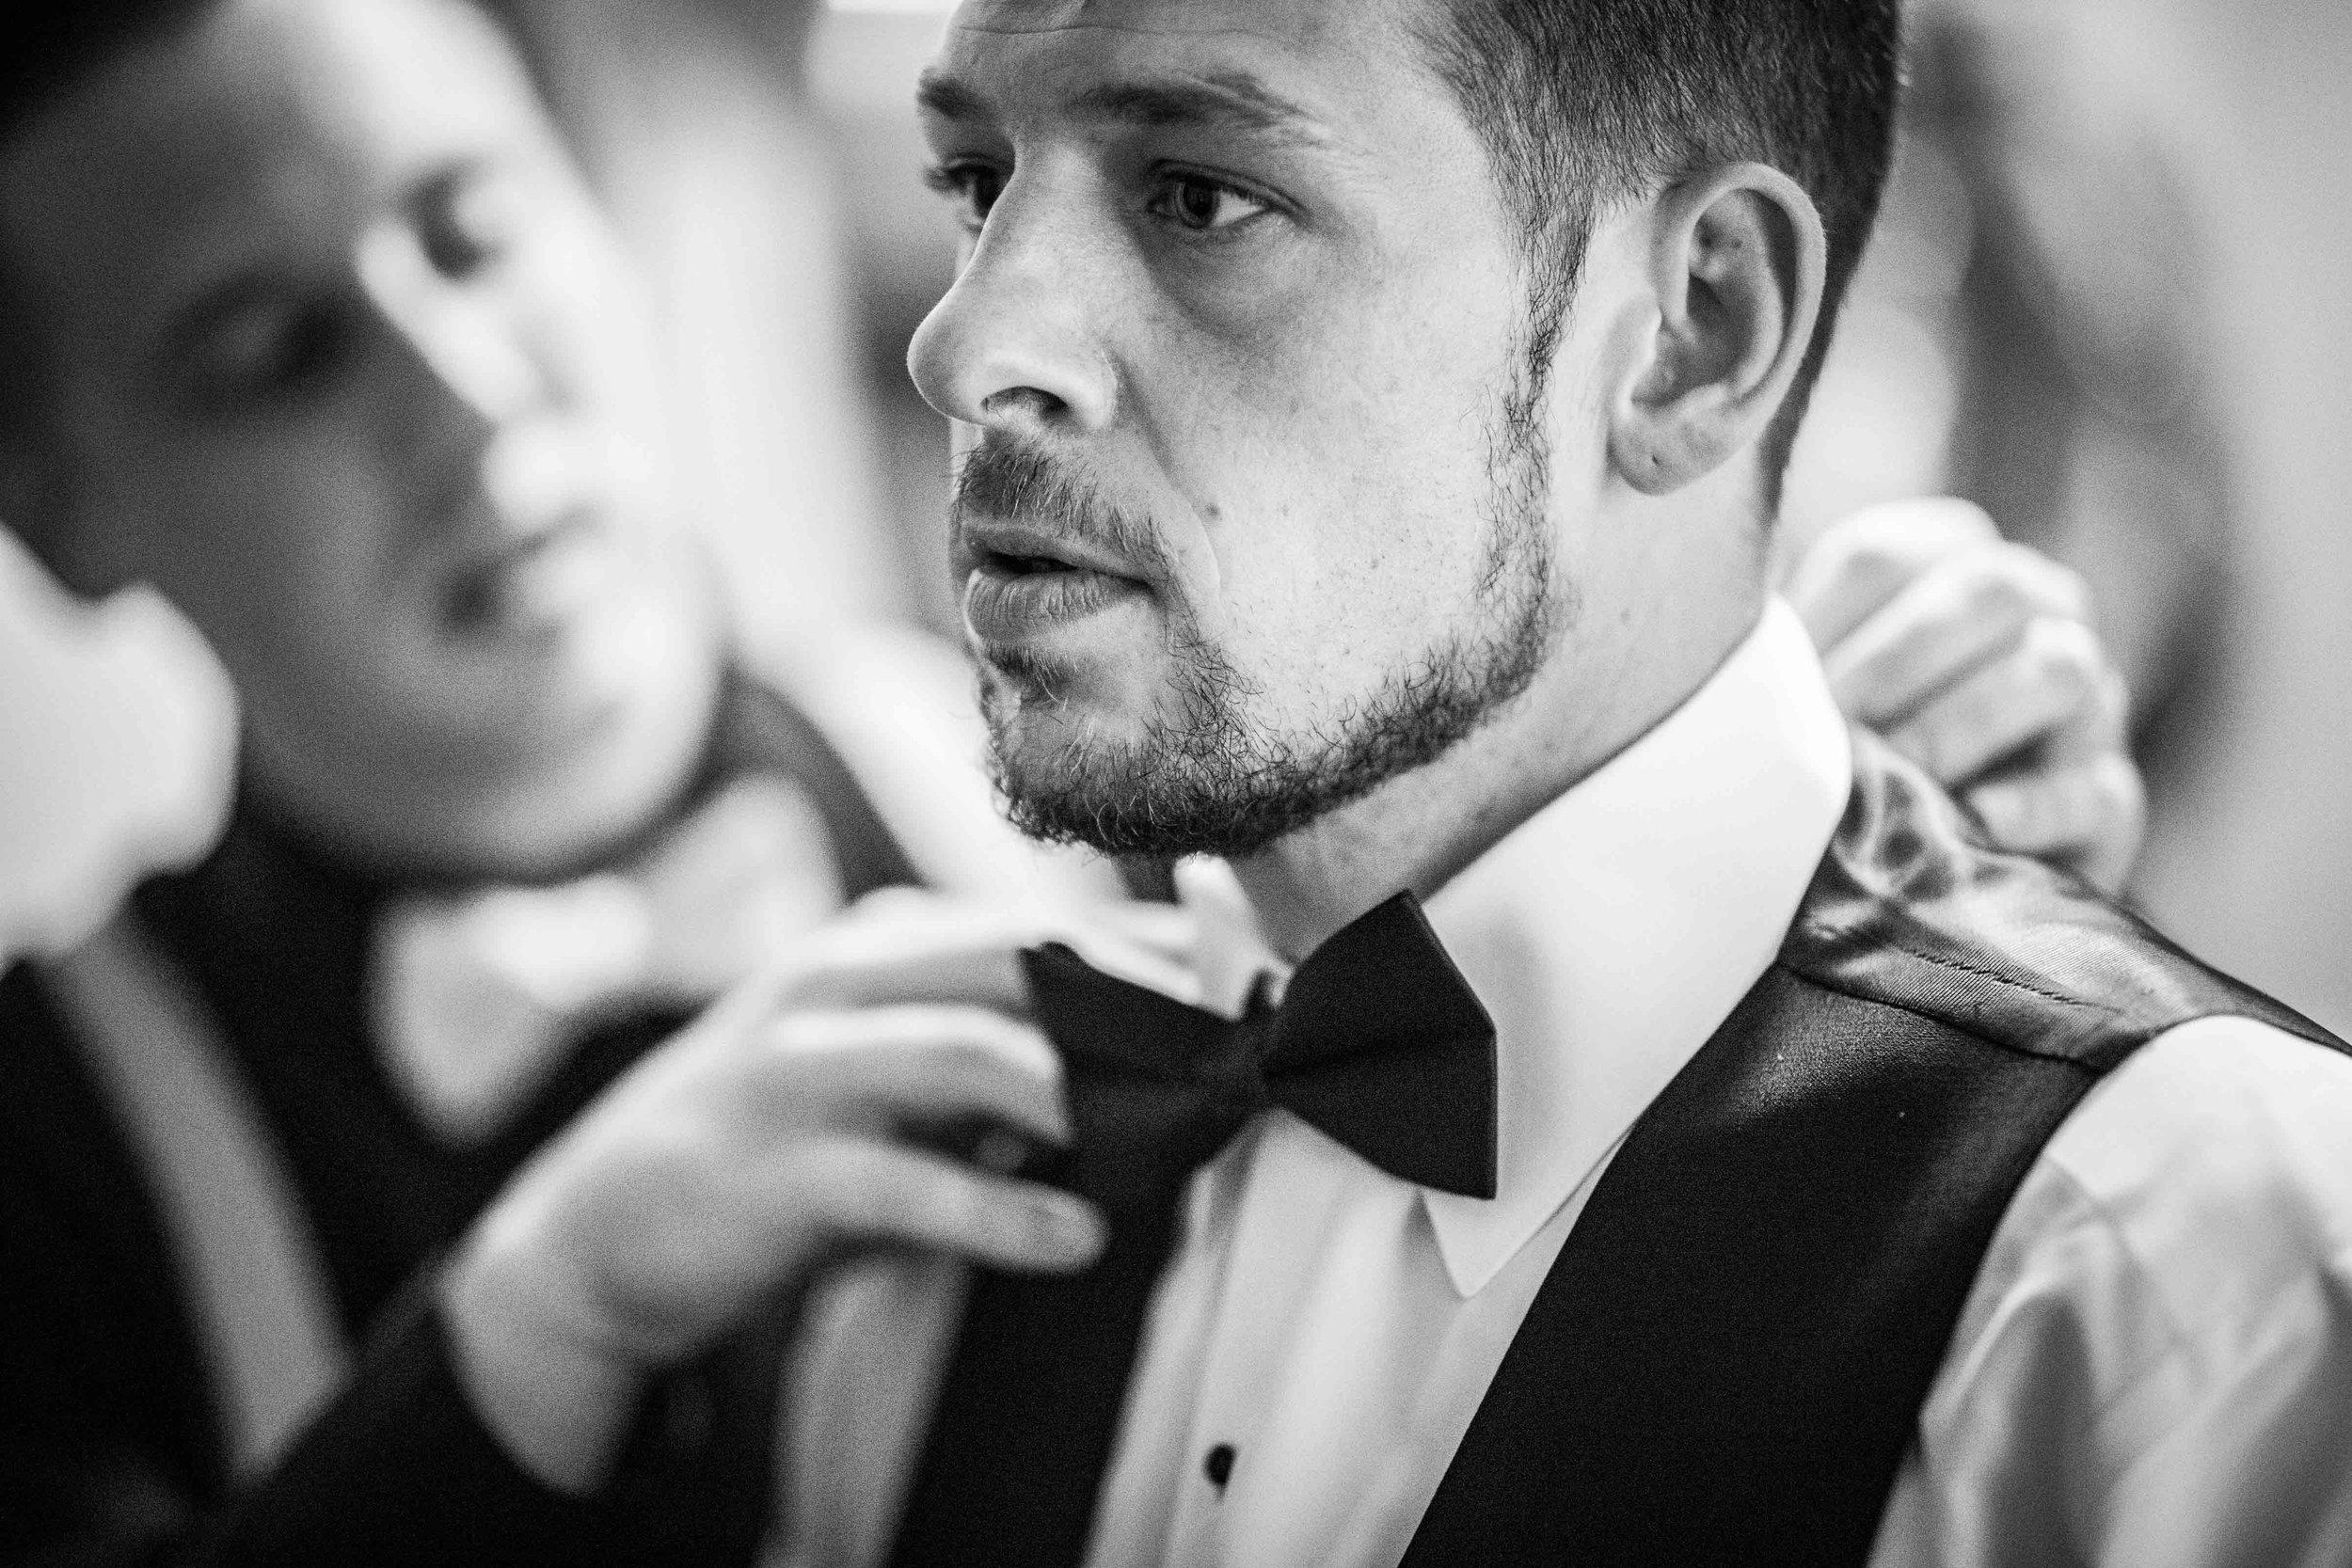 Groomsmen straitens the grooms bowtie as he looks in the mirror